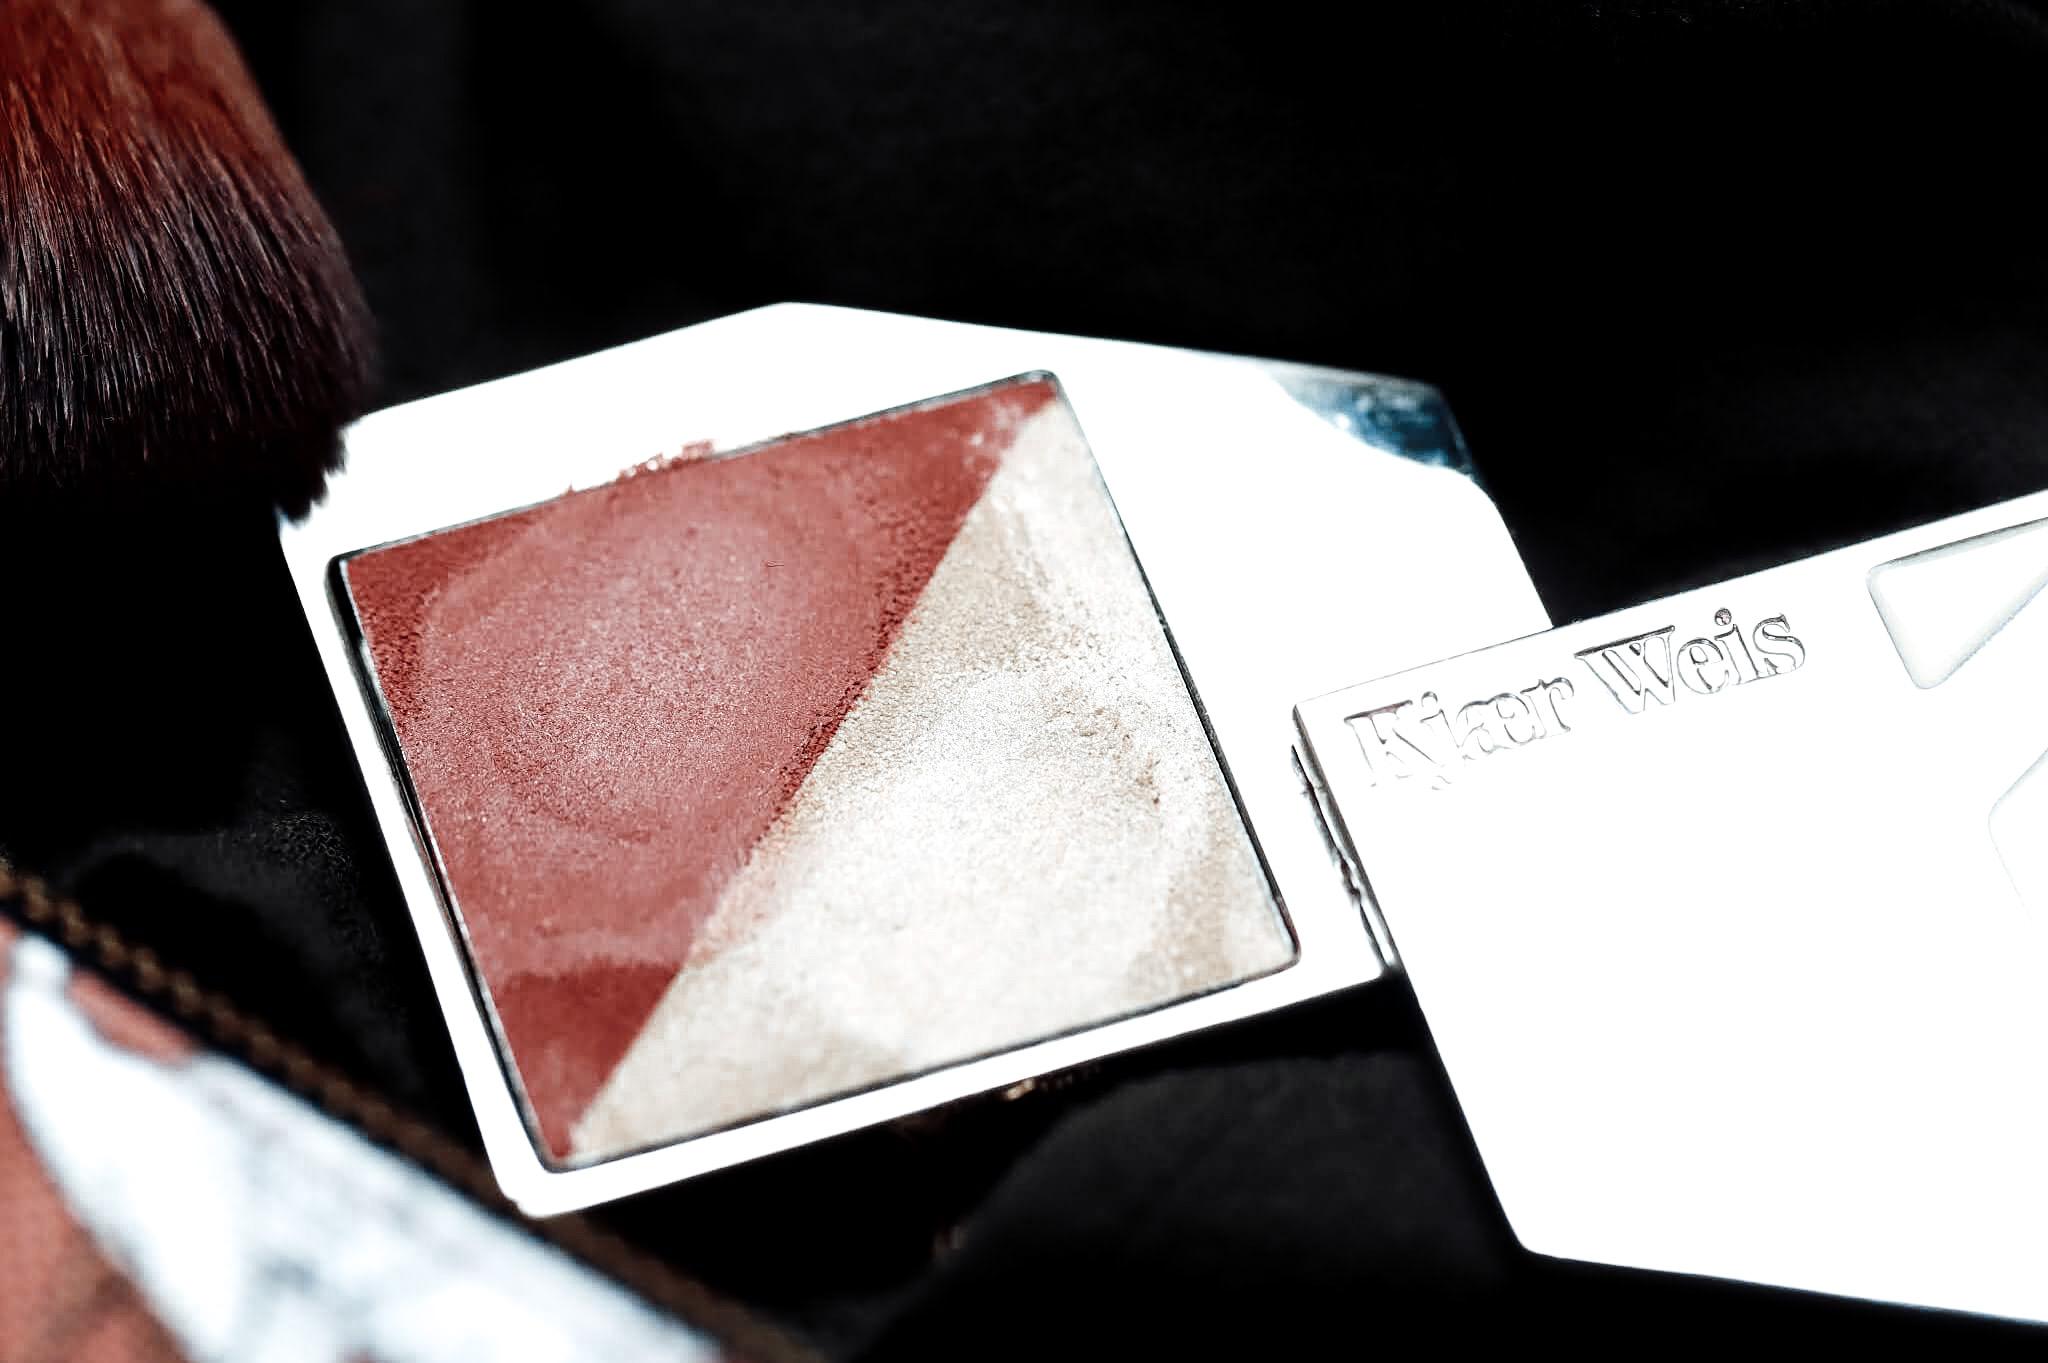 Kjaer Weis Flush Glow Duo Vibrant Ray